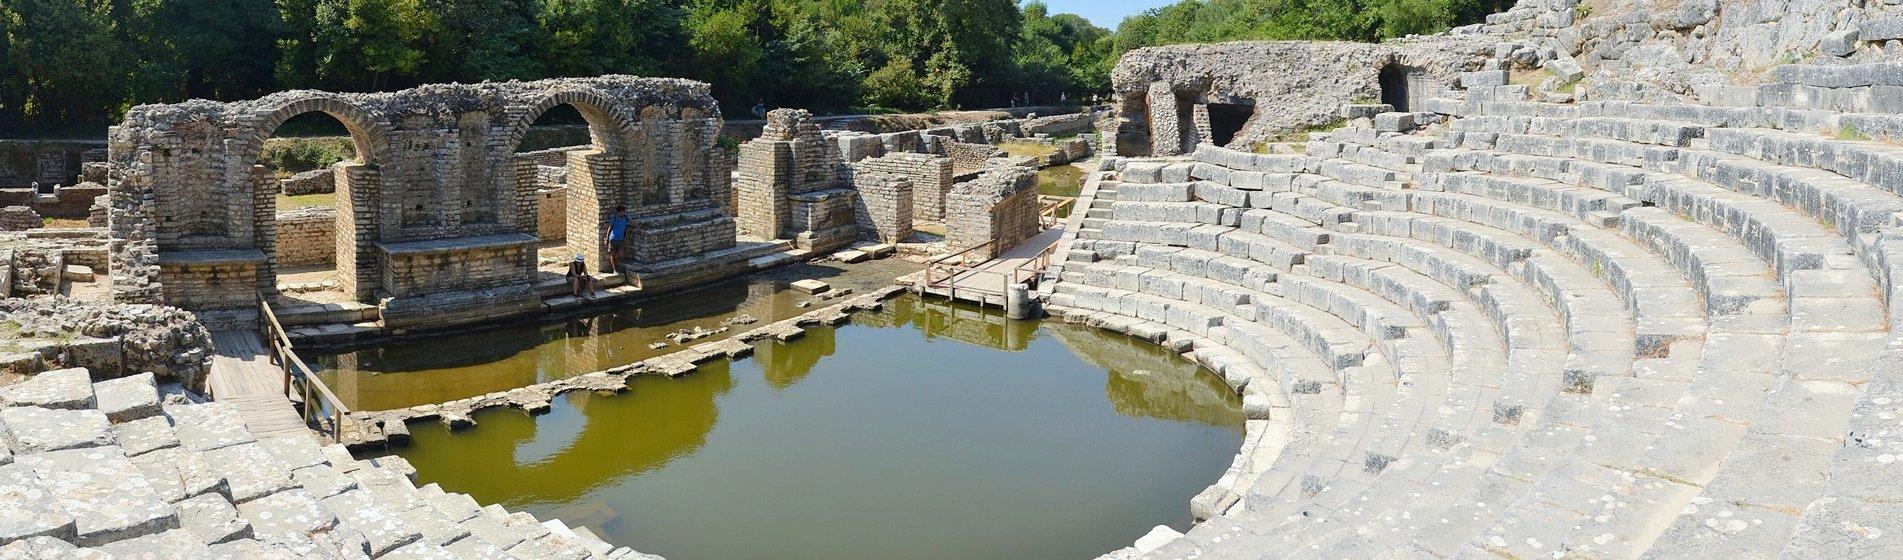 Amphitheater of Butrint